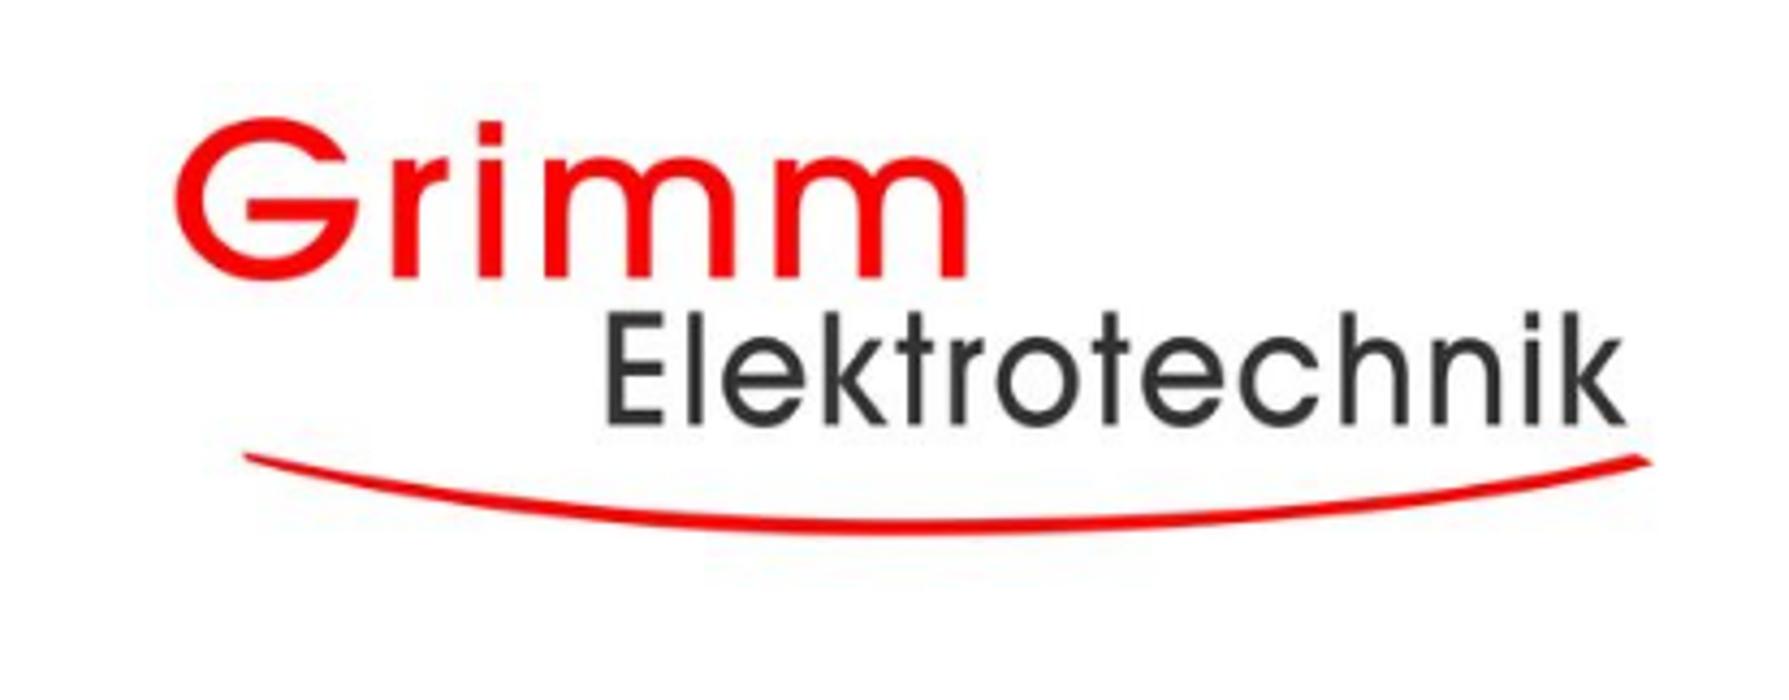 Bild zu Grimm Elektrotechnik GmbH & Co. KG in Mietingen